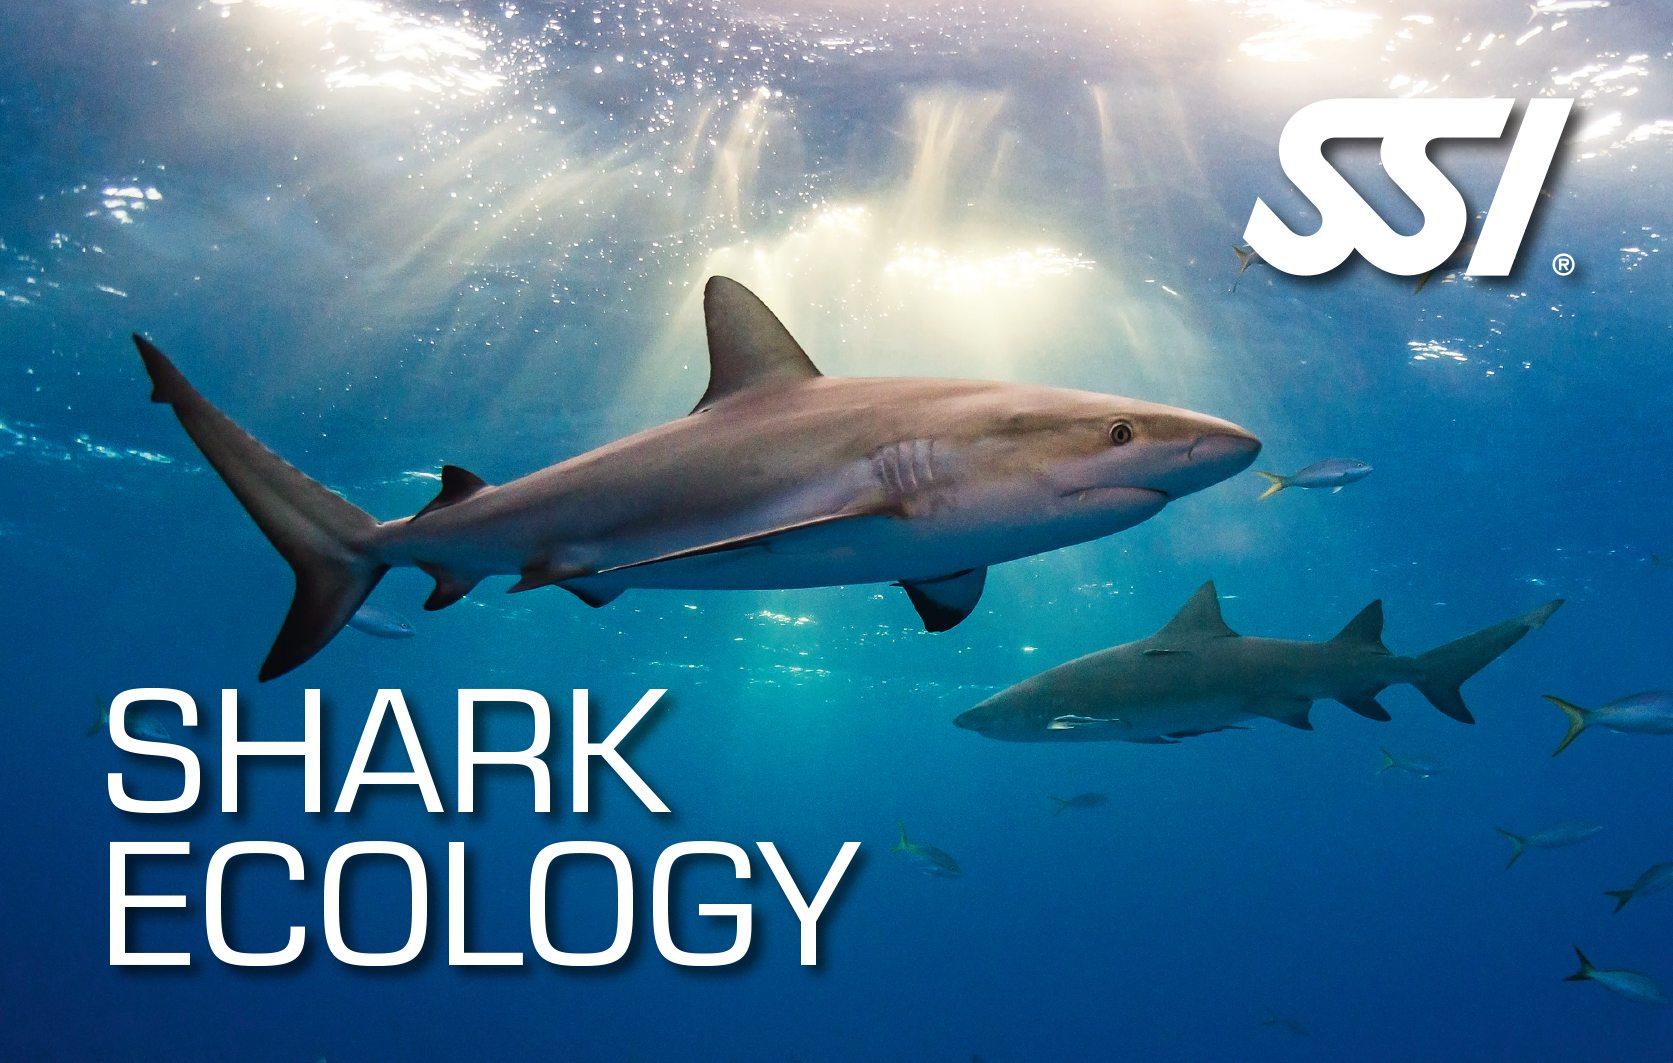 SSI Shark Ecology | SSI Shark Ecology Course | Shark Ecology | Specialty Course | Diving Course